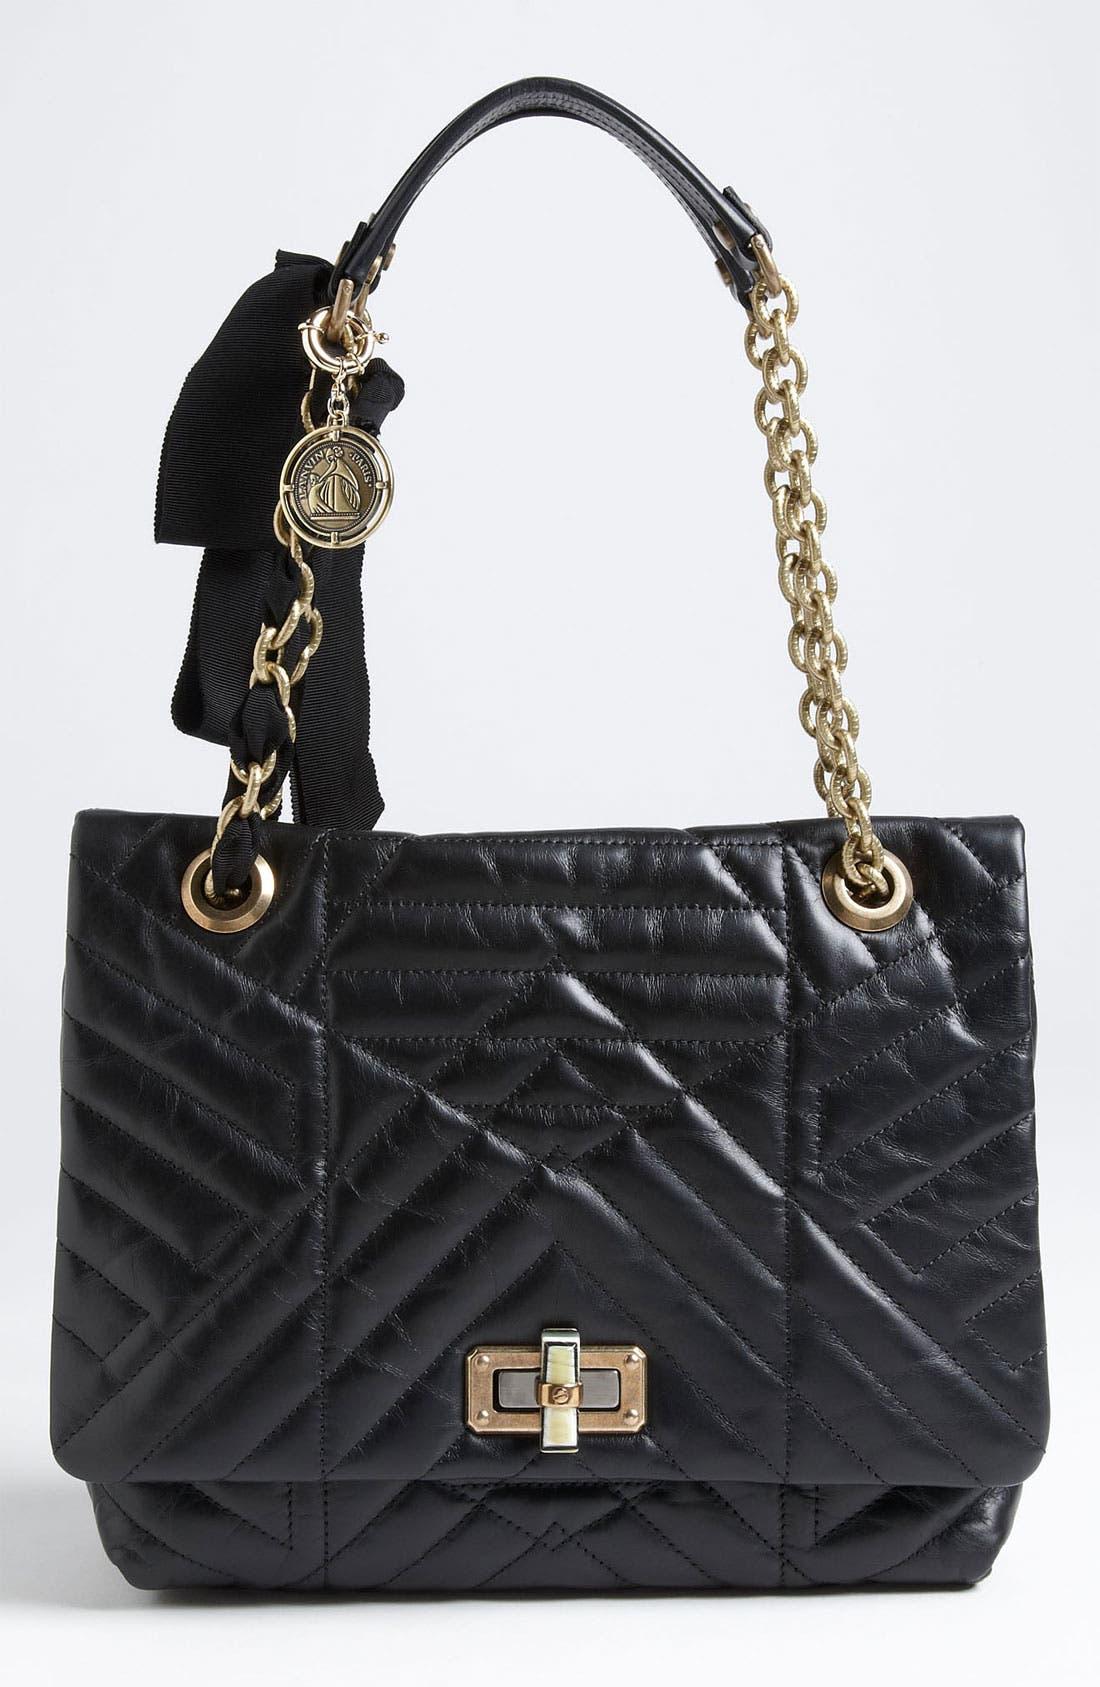 Alternate Image 1 Selected - Lanvin 'Happy' Quilted Leather Shoulder Bag